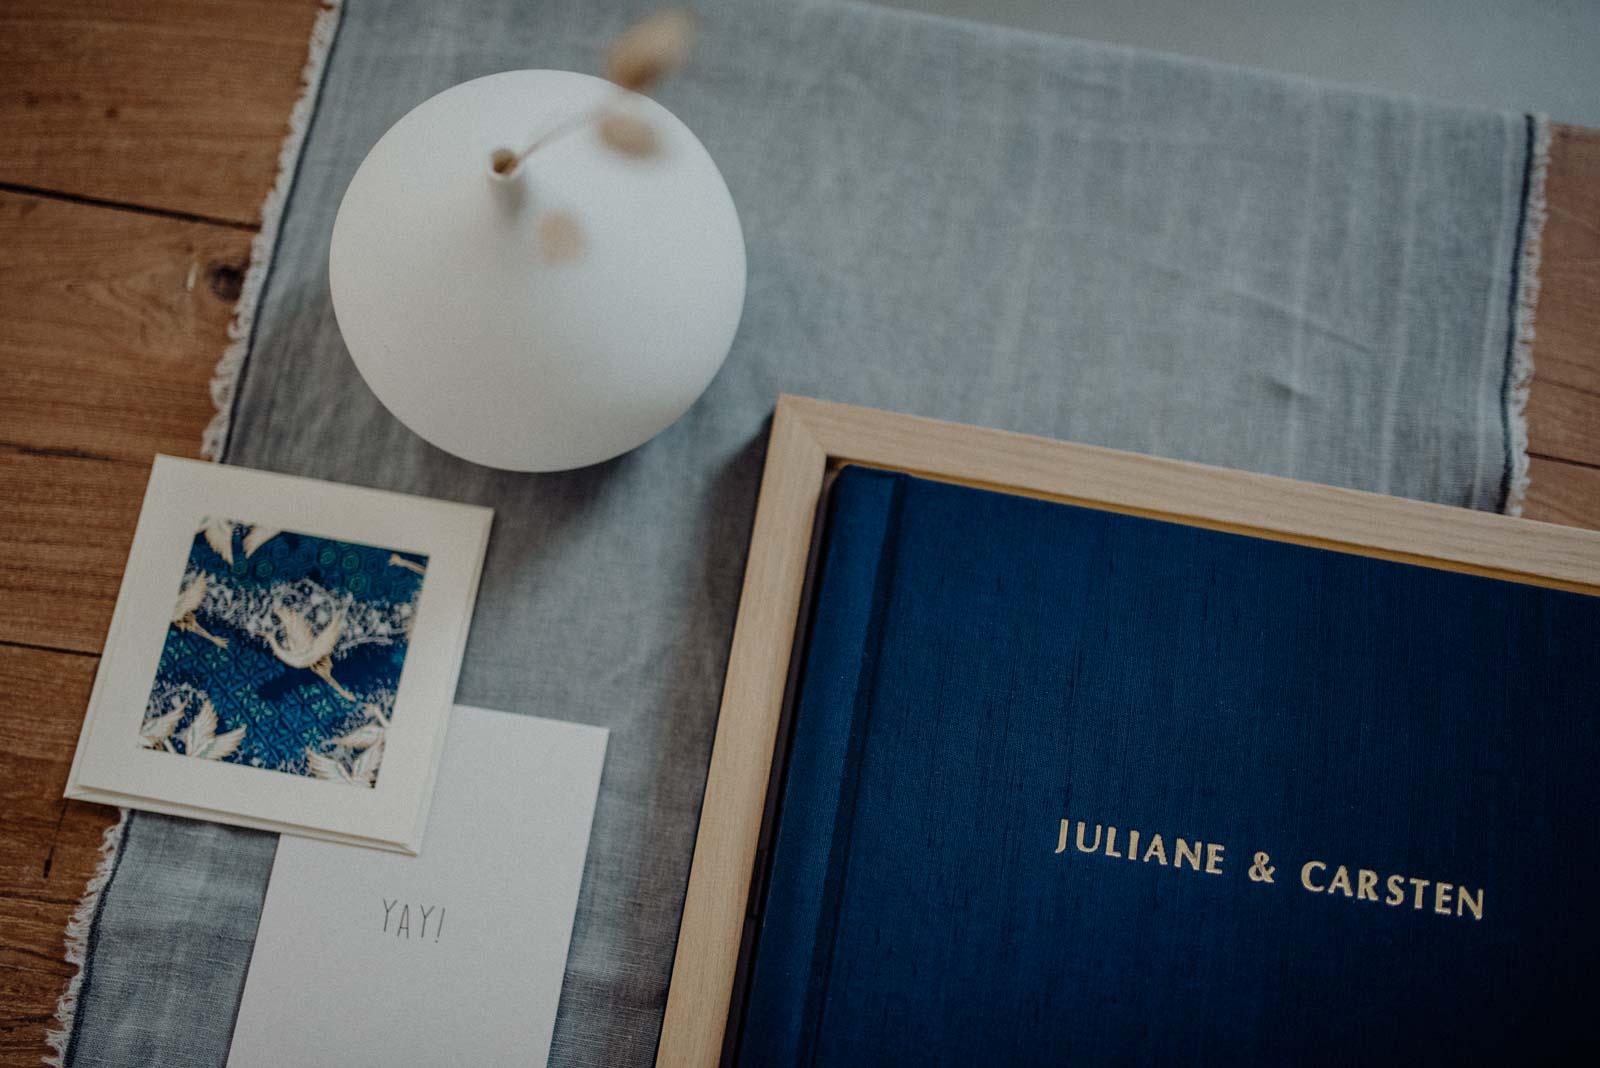 041-Fotoalbum-Fotobuch-Premium-Fotograf-Witten-Luxus